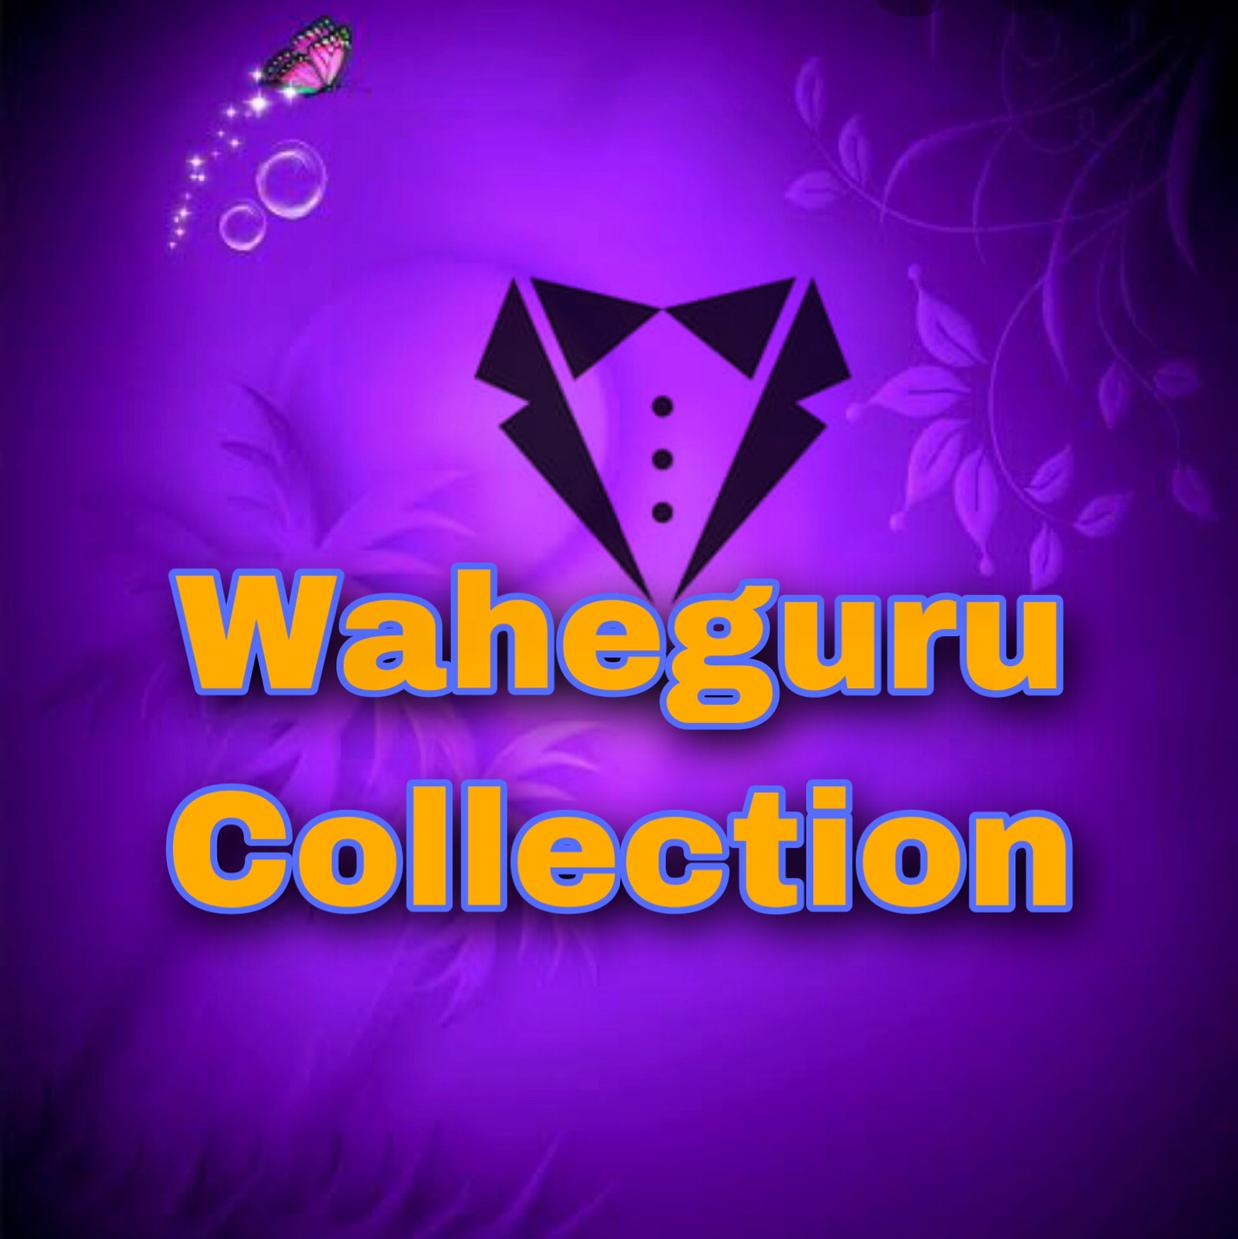 Waheguru collection